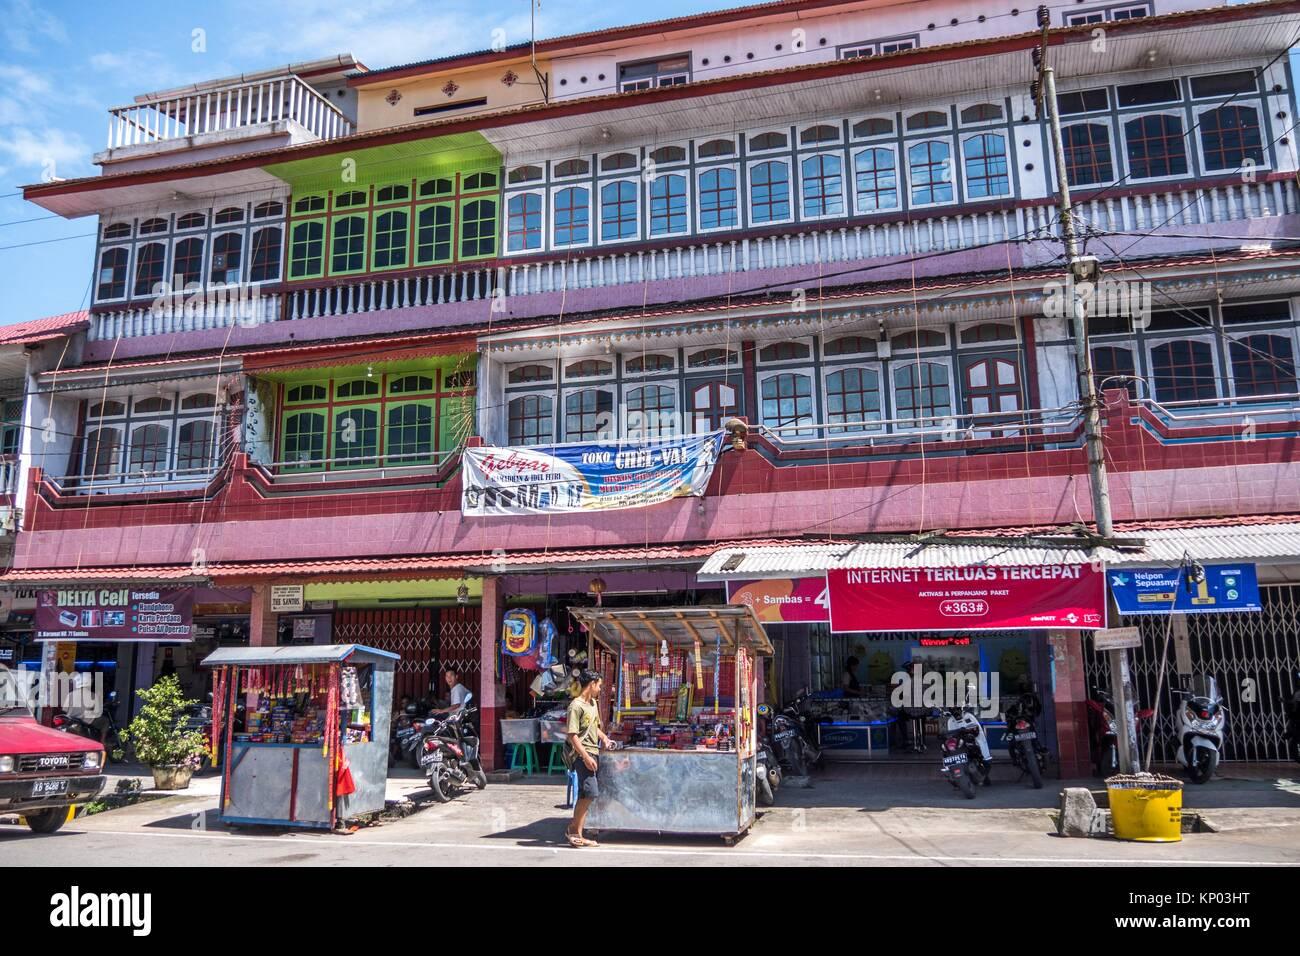 Shophouses in Sambas, West Kalimantan, Indonesia - Stock Image